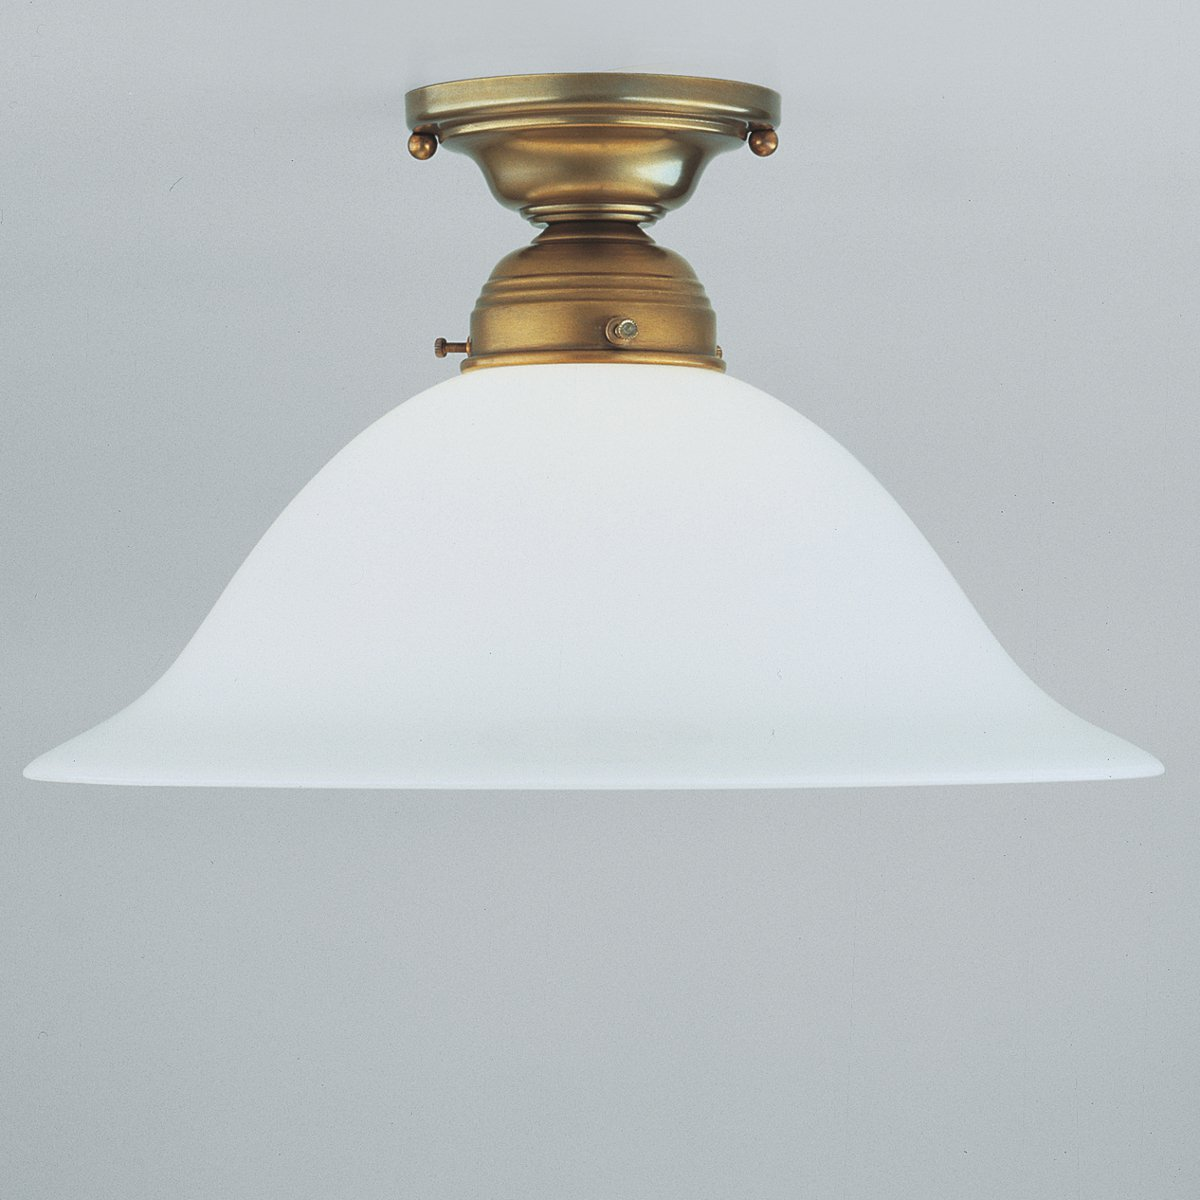 ida klassische deckenlampe mit verschiedenen glasschirmen von berliner messinglampen g nstig. Black Bedroom Furniture Sets. Home Design Ideas